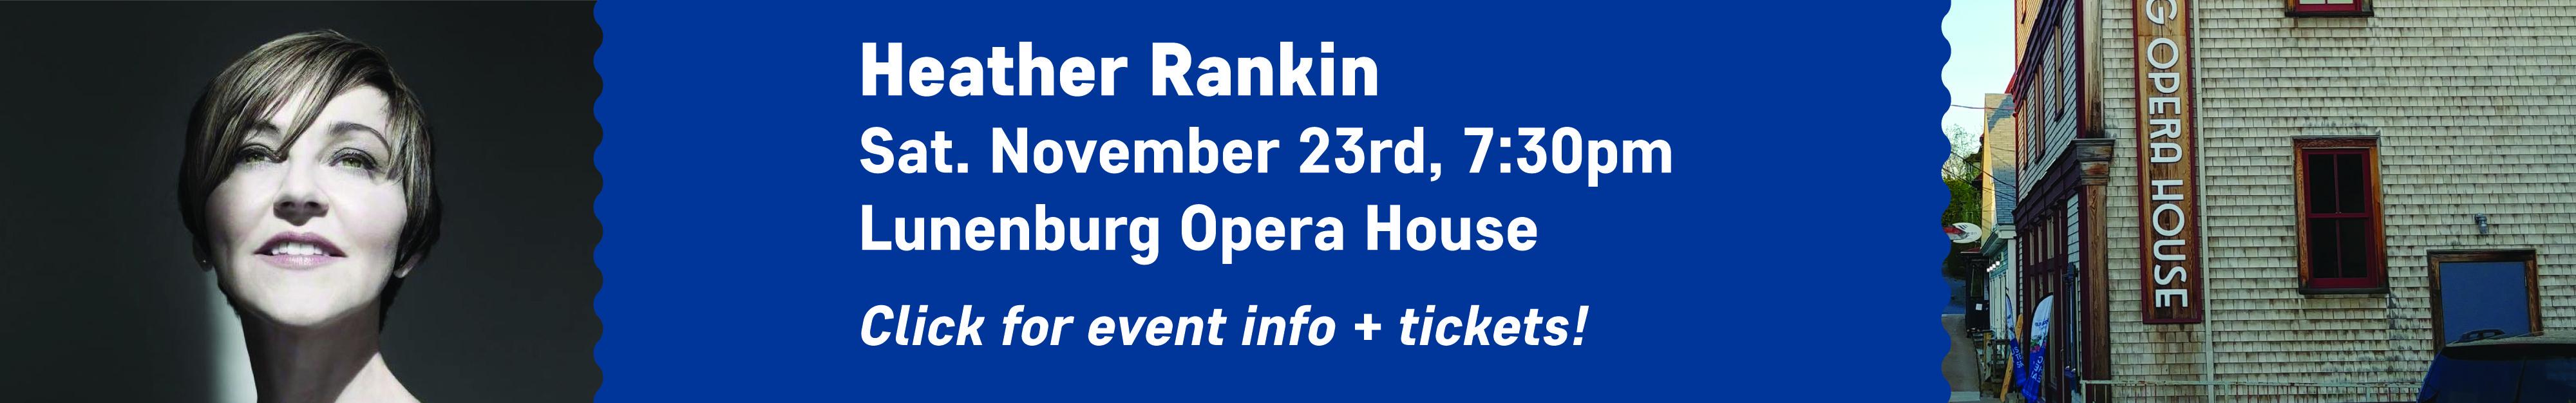 Heather Rankin - Lunenburg Opera House